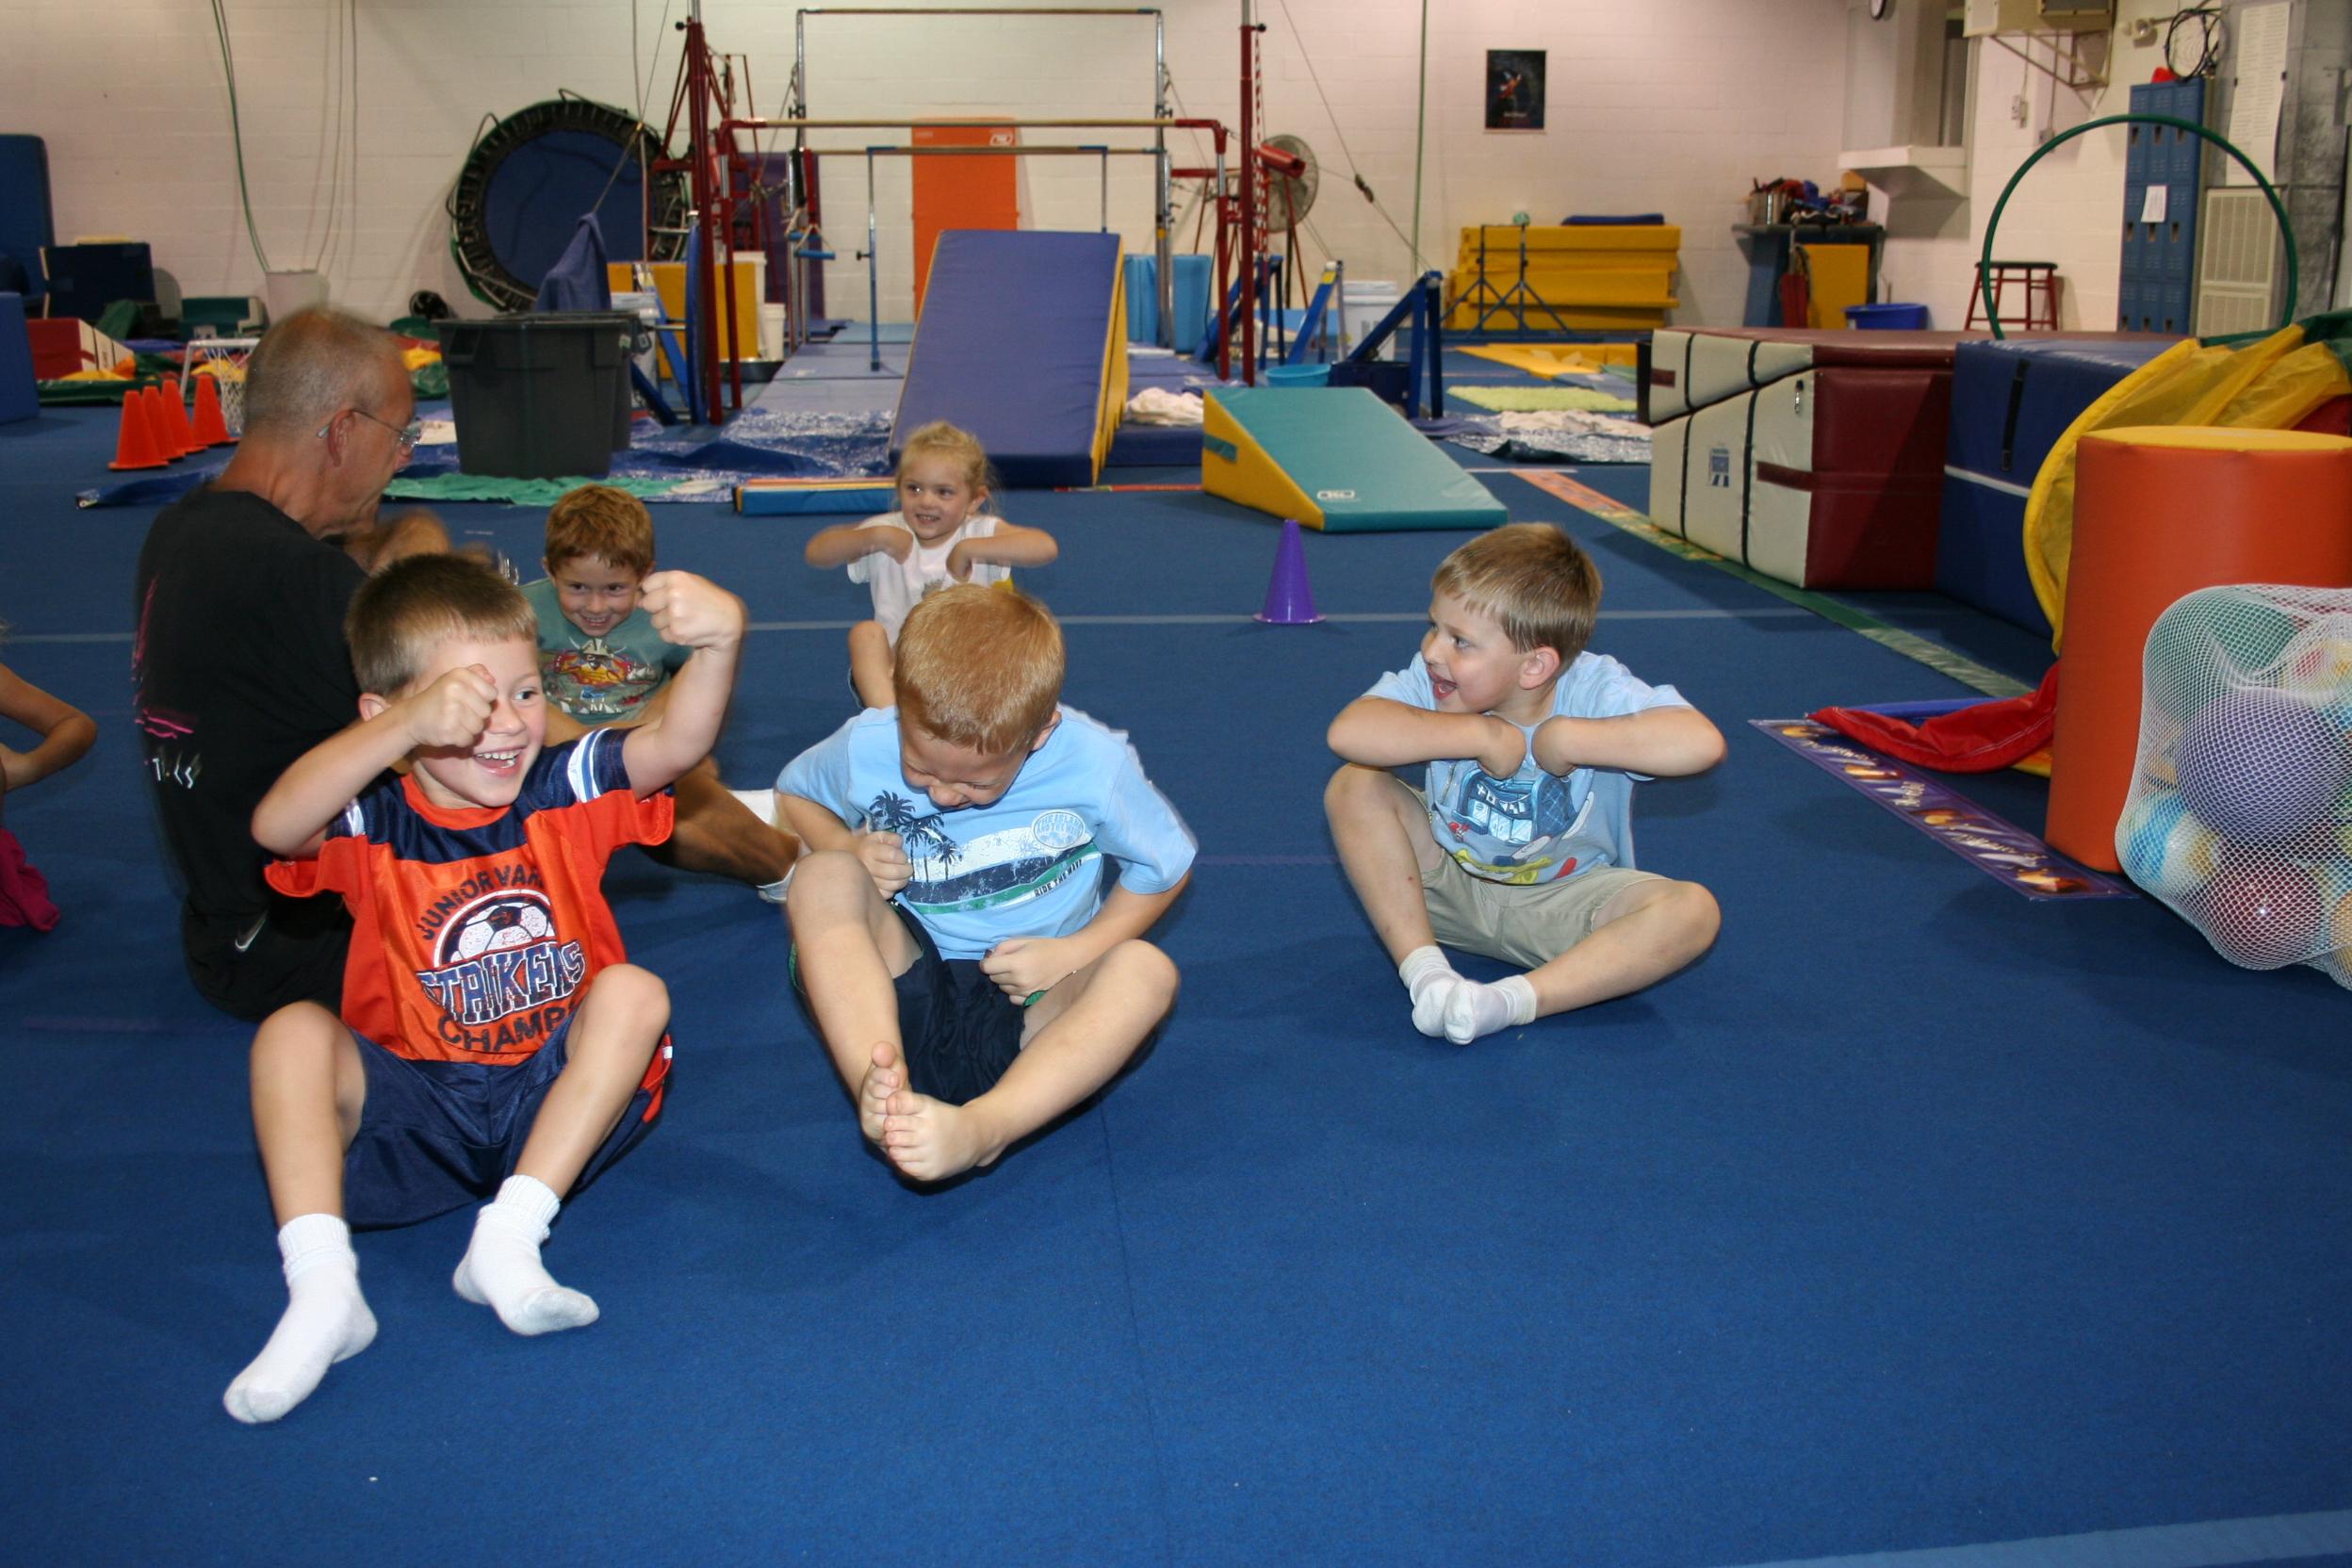 887c7a423e613 Gymnastics and Cheer Tumbling Classes